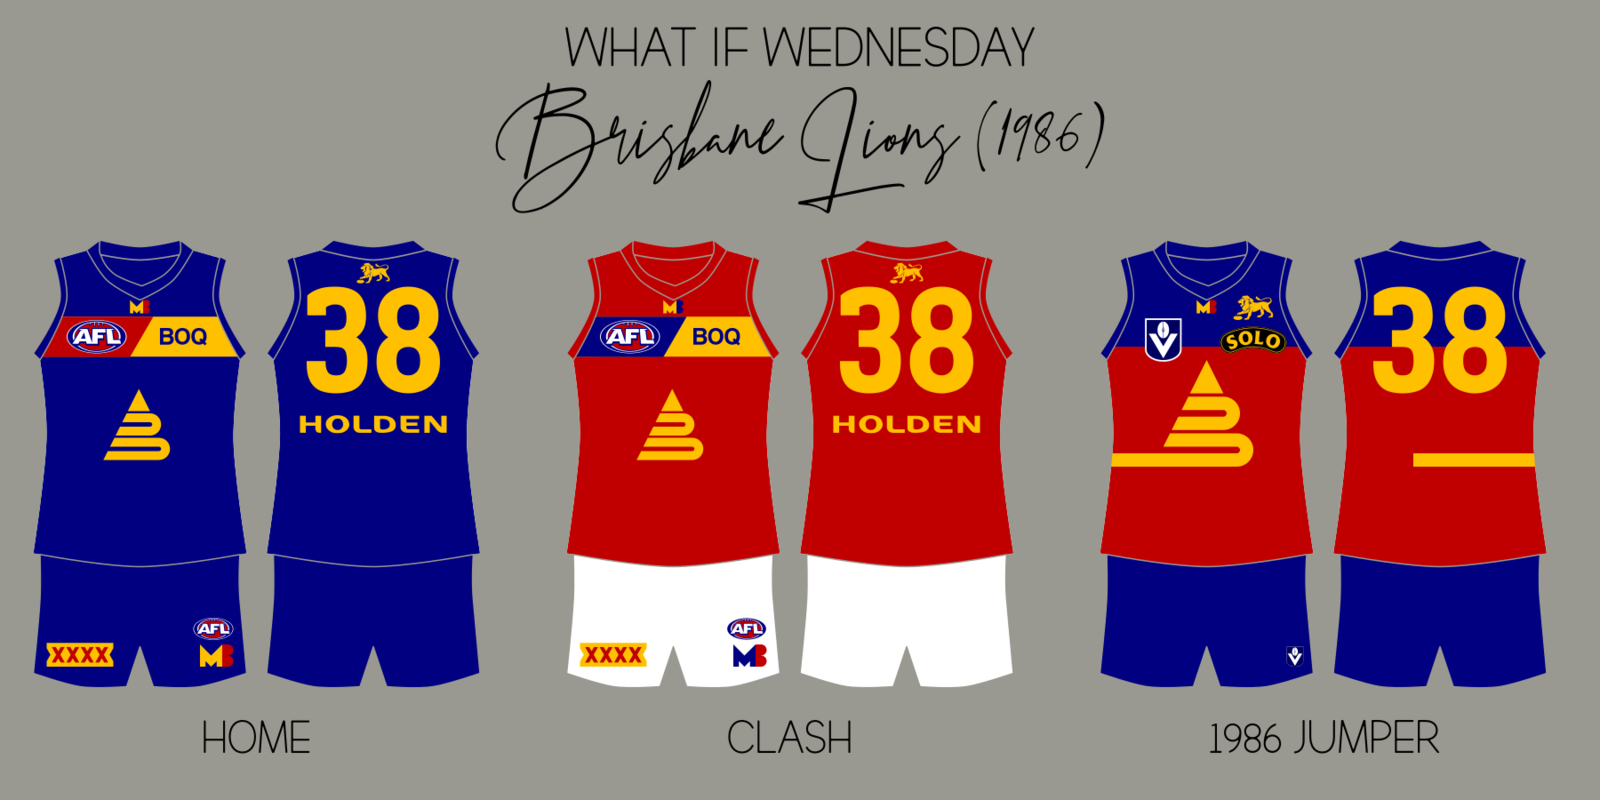 x15 Brisbane Lions (1986).png